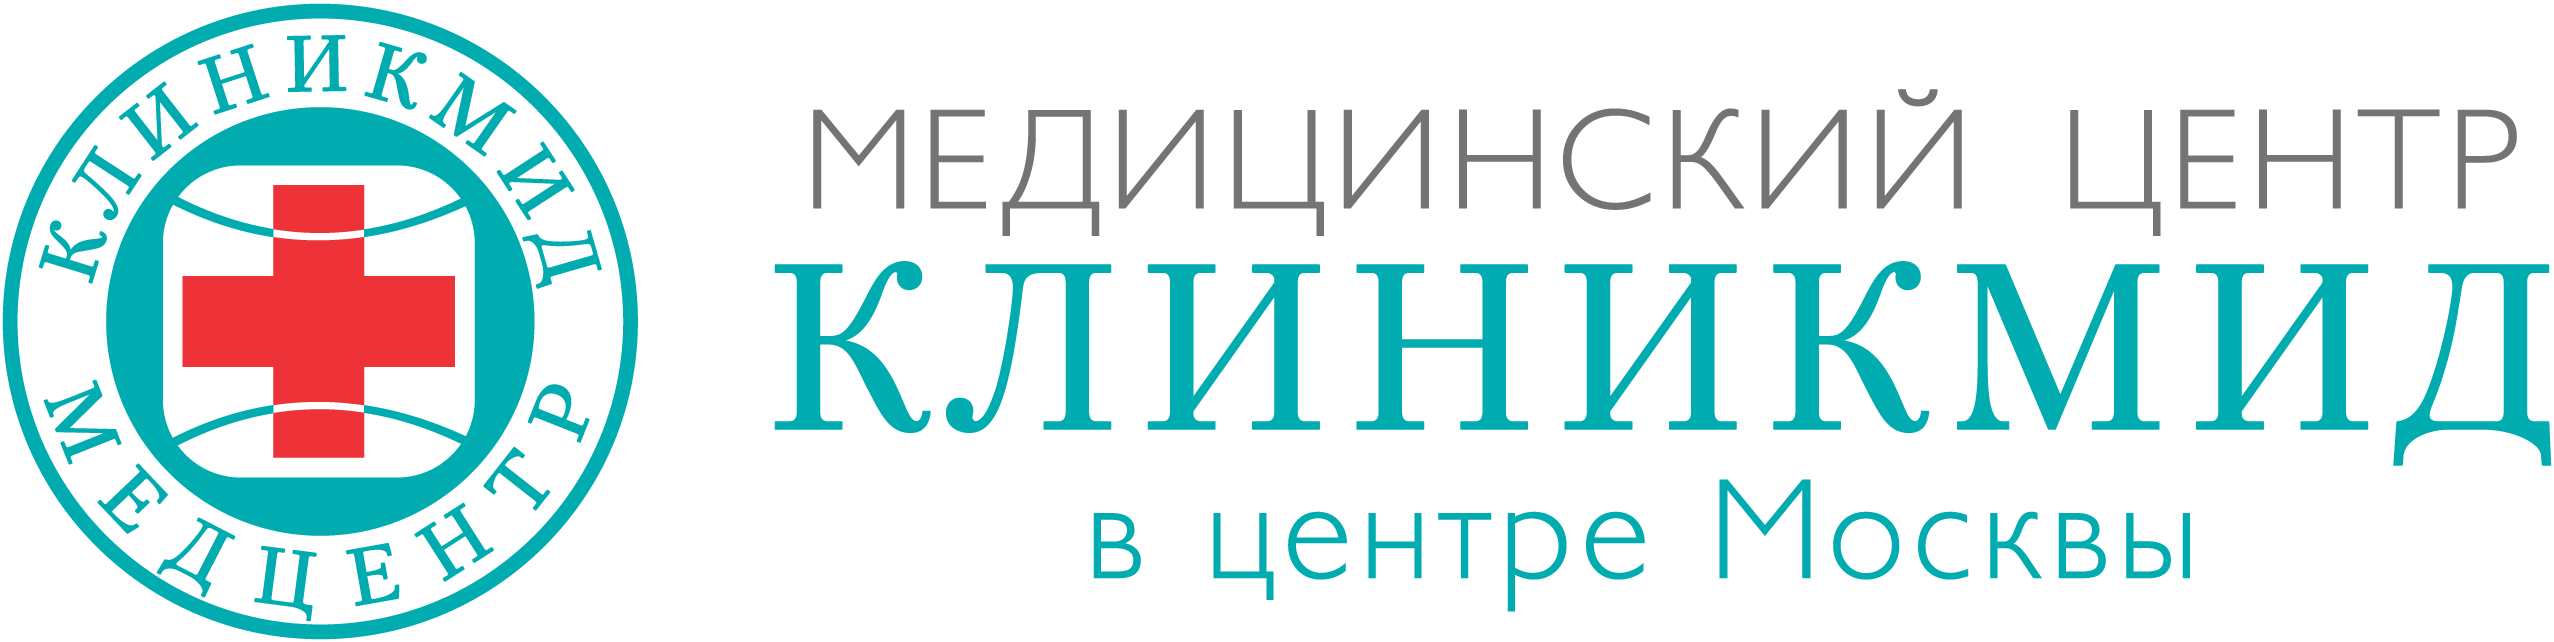 "Медицинский центр ""Клиникмид"""